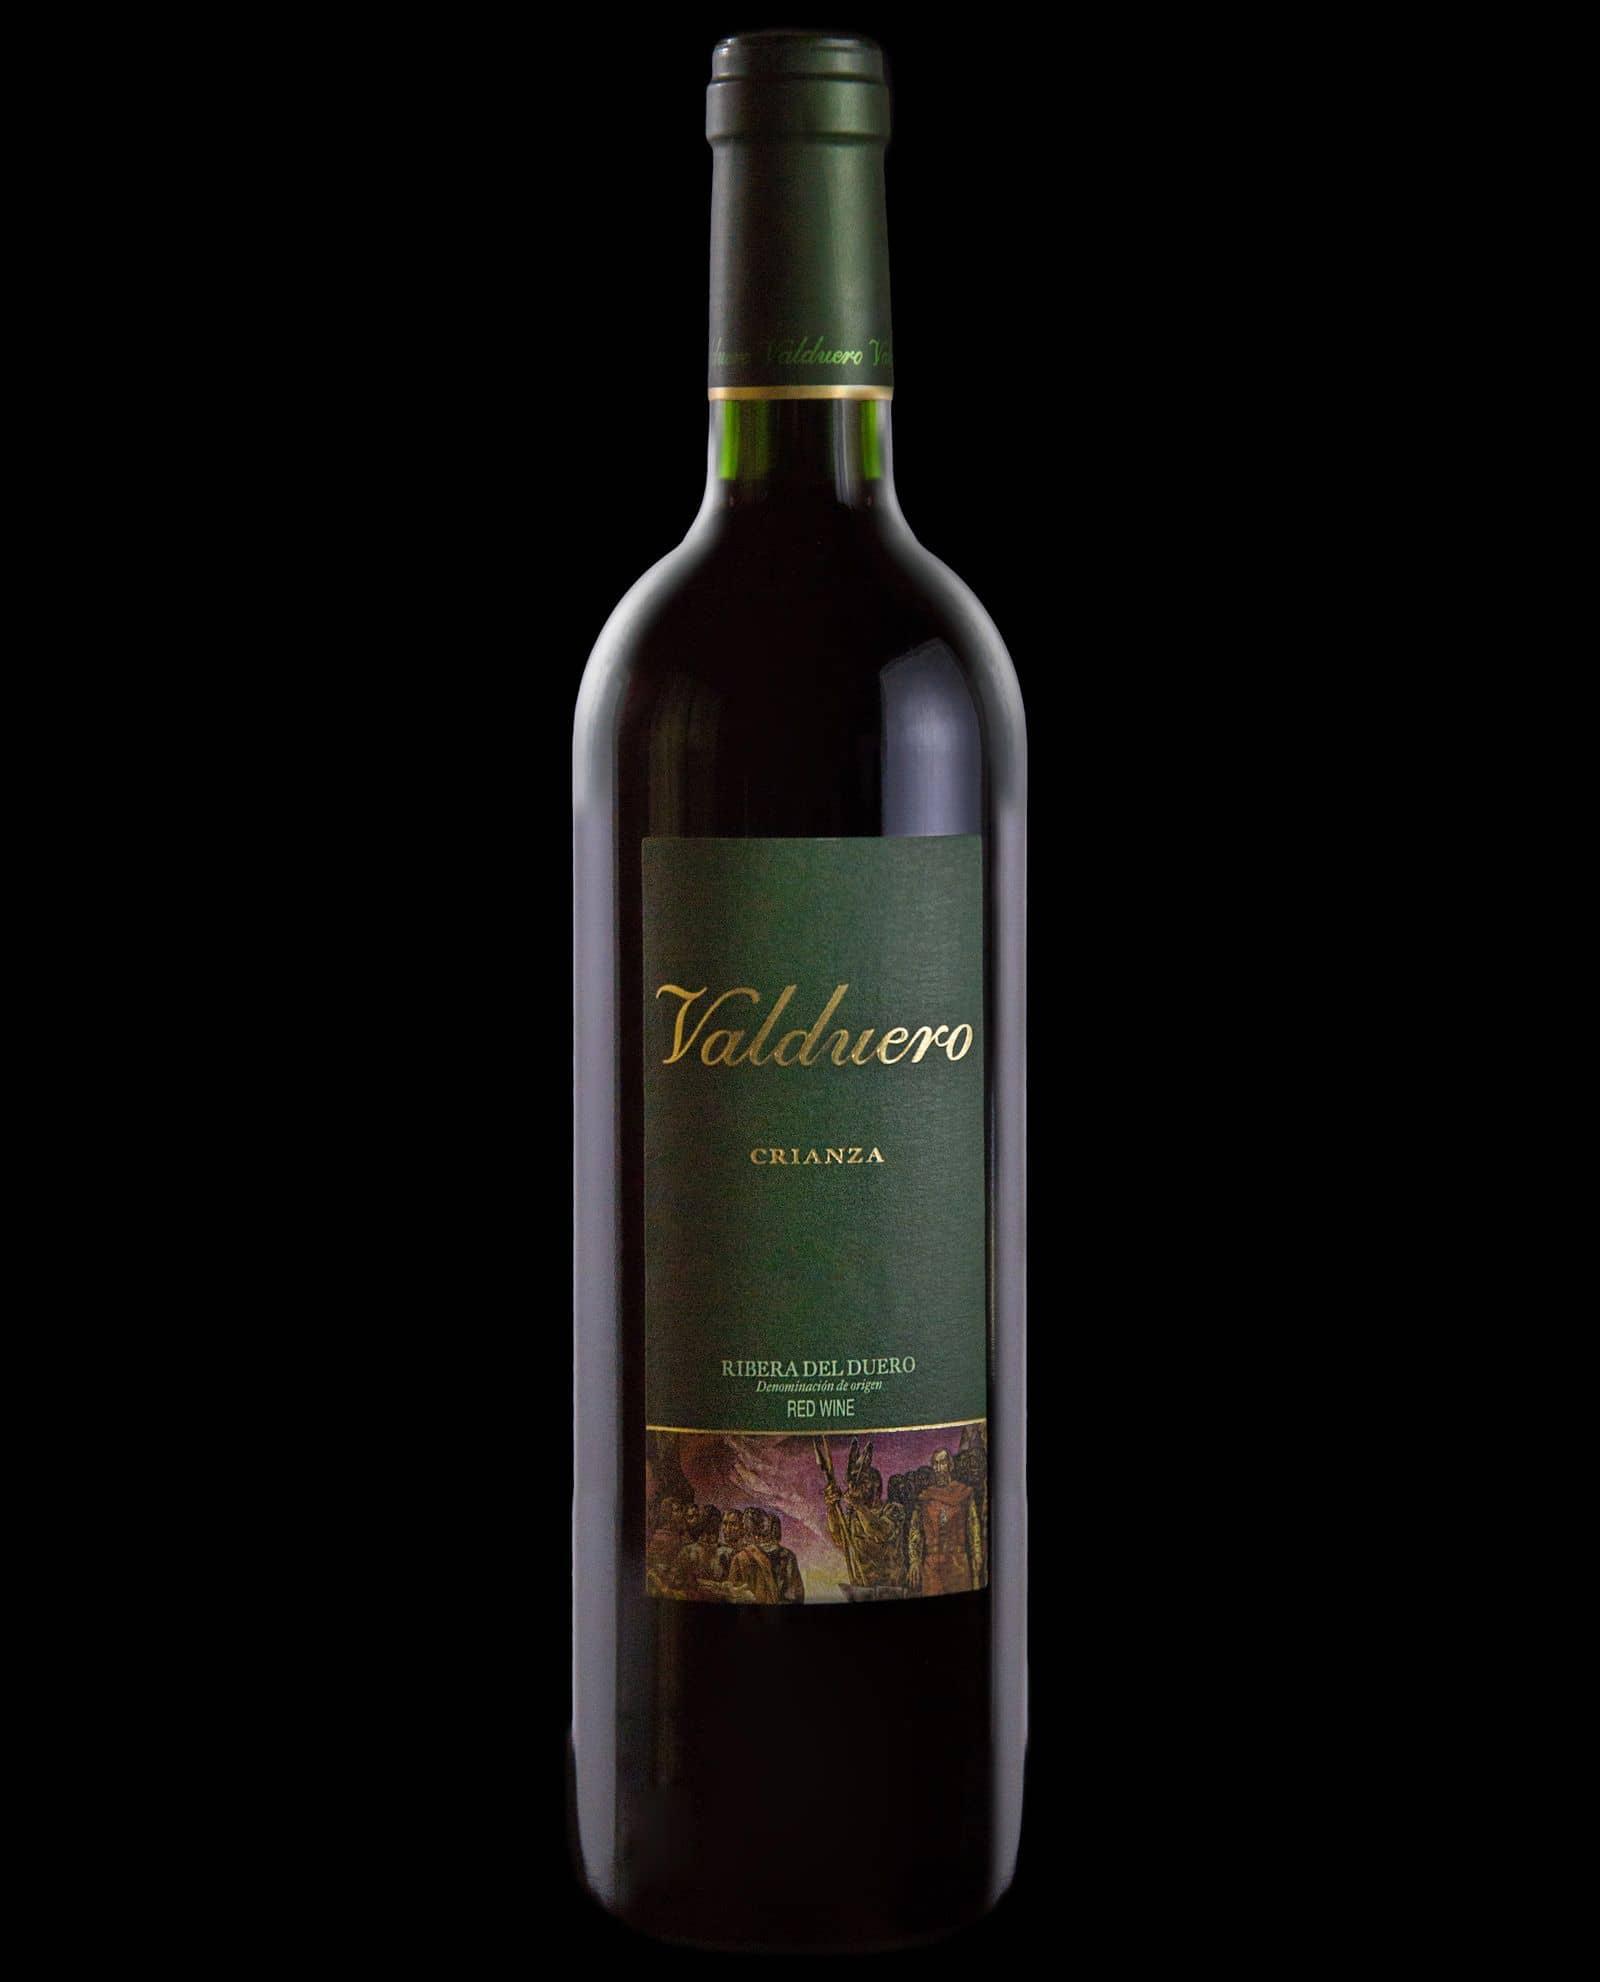 Botella Valduero crianza, vino tinto de la Ribera del Duero